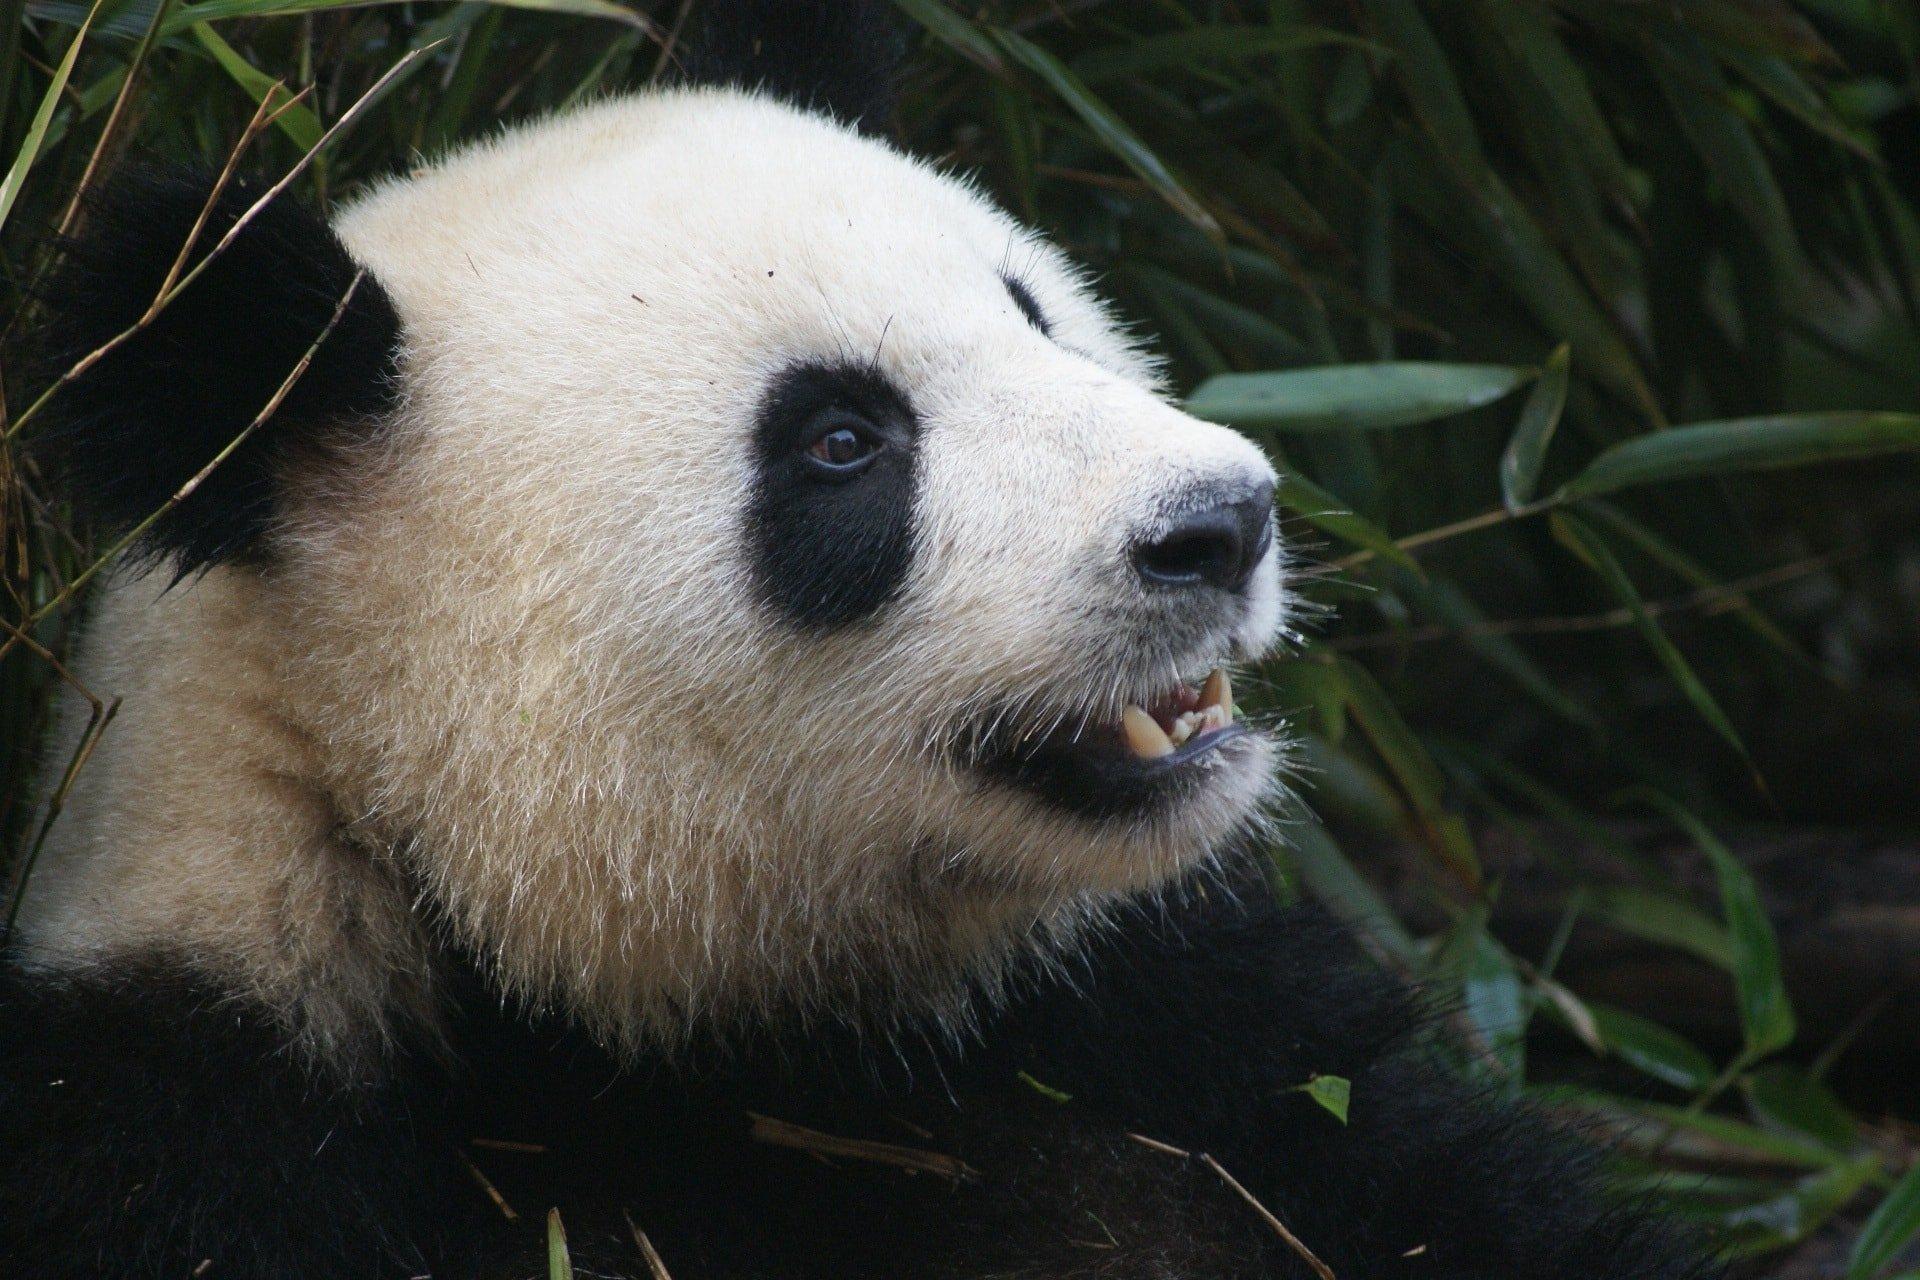 Giant Panda in a breeding center, Chengdu,China